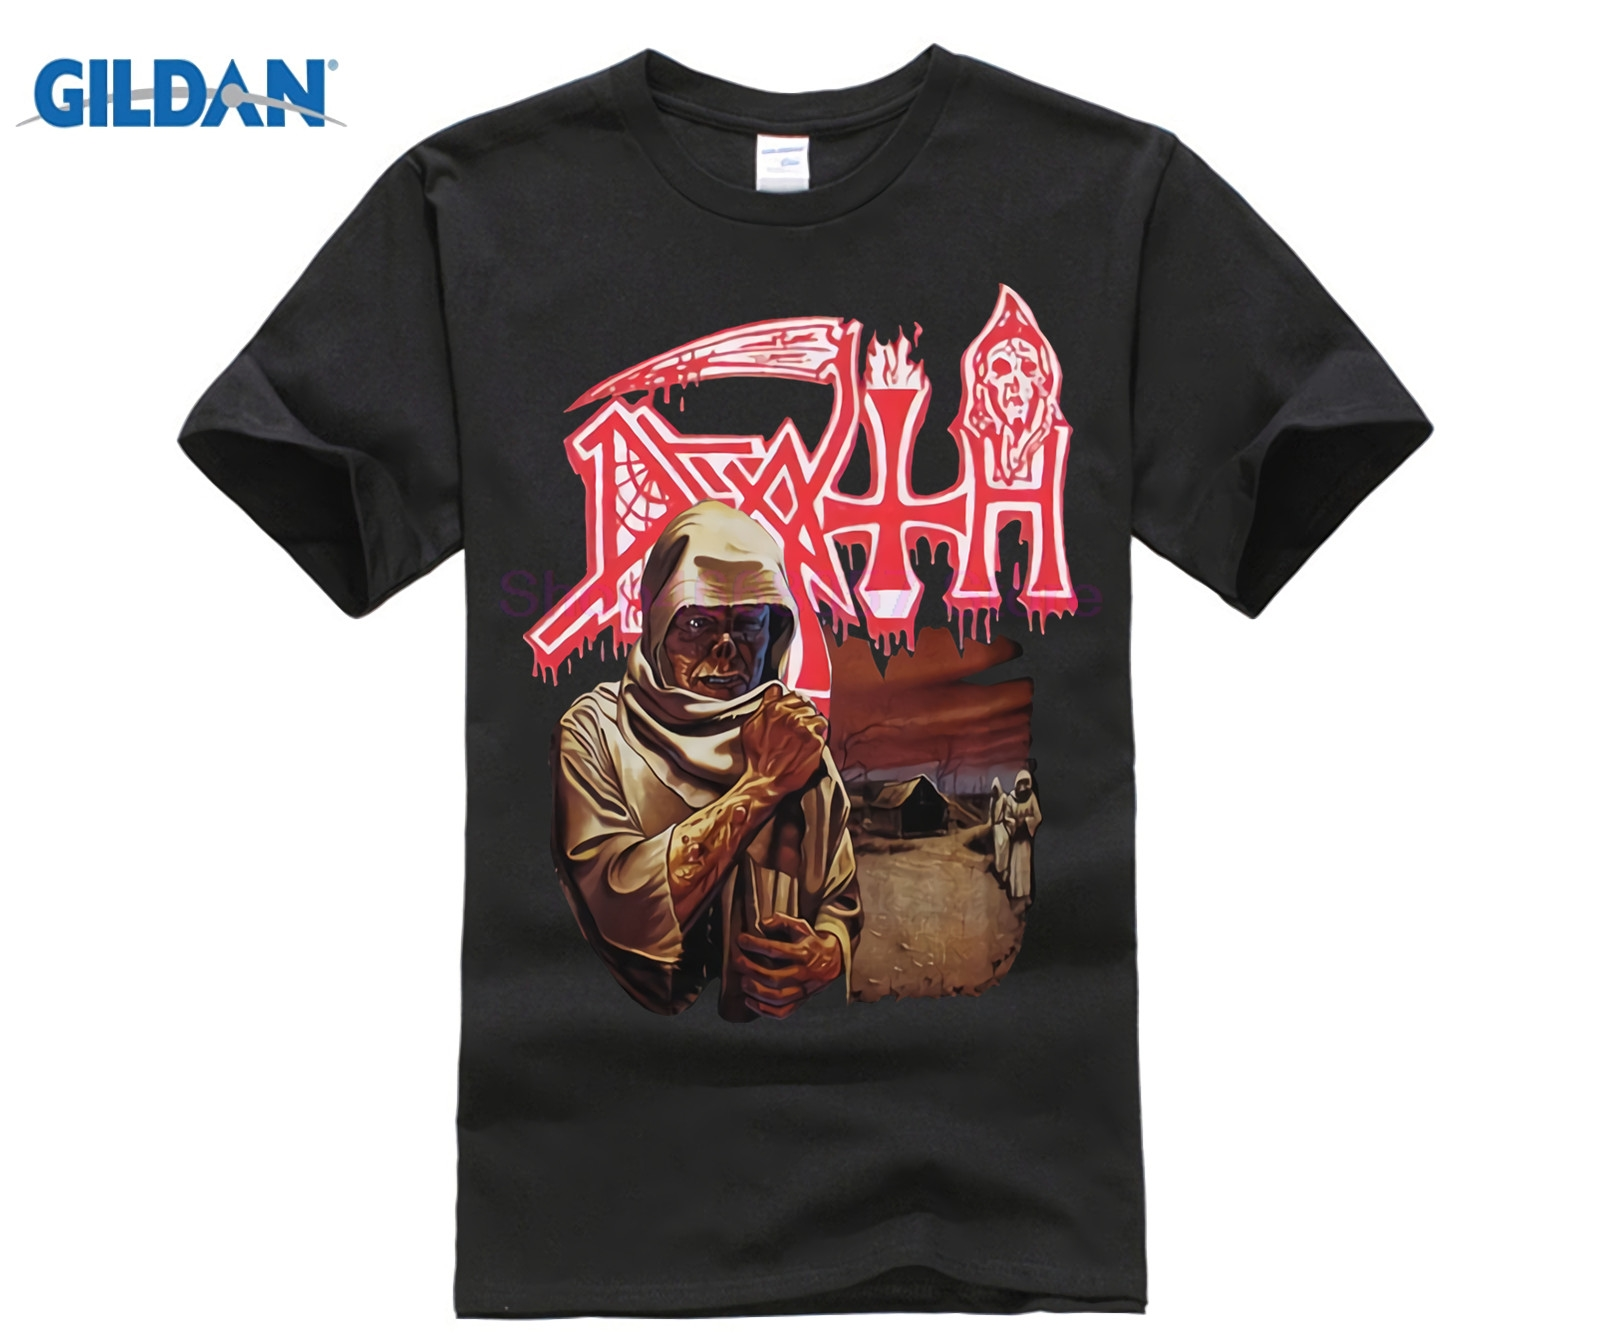 Talking Heads Rock Band Album Cover Men/'s Black T-Shirt Size S to 3XL